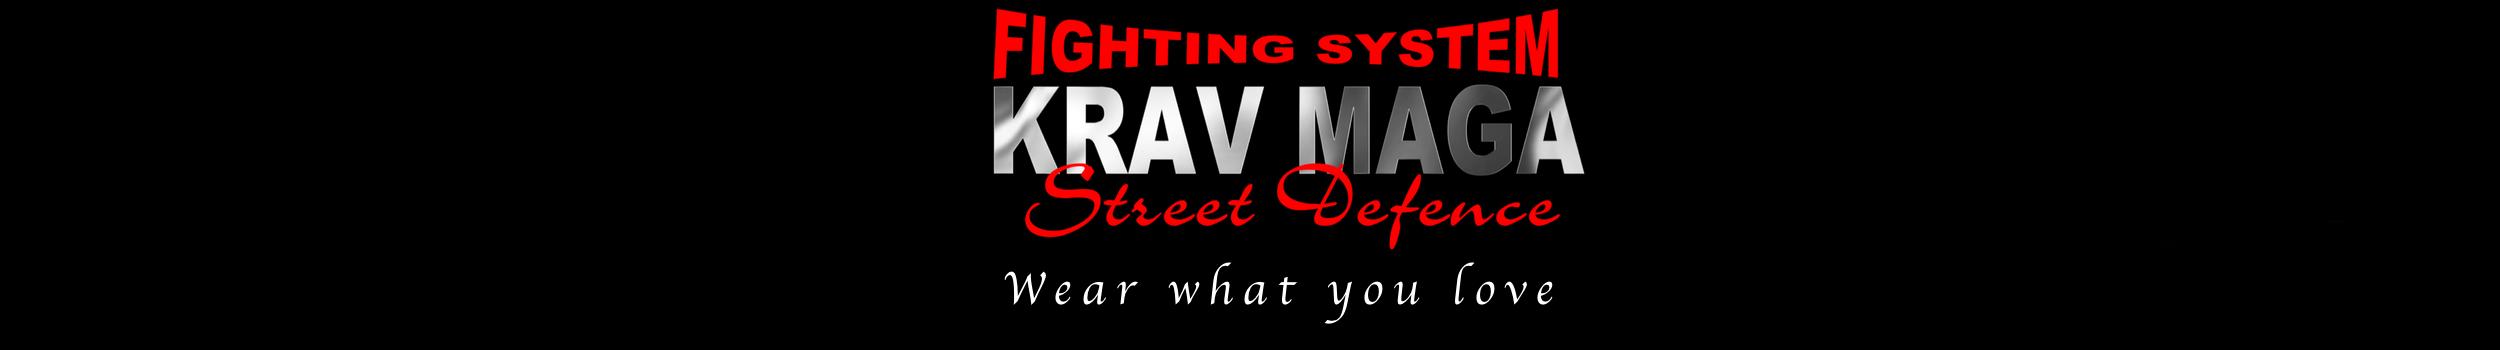 Krav Maga Street Defence Shop